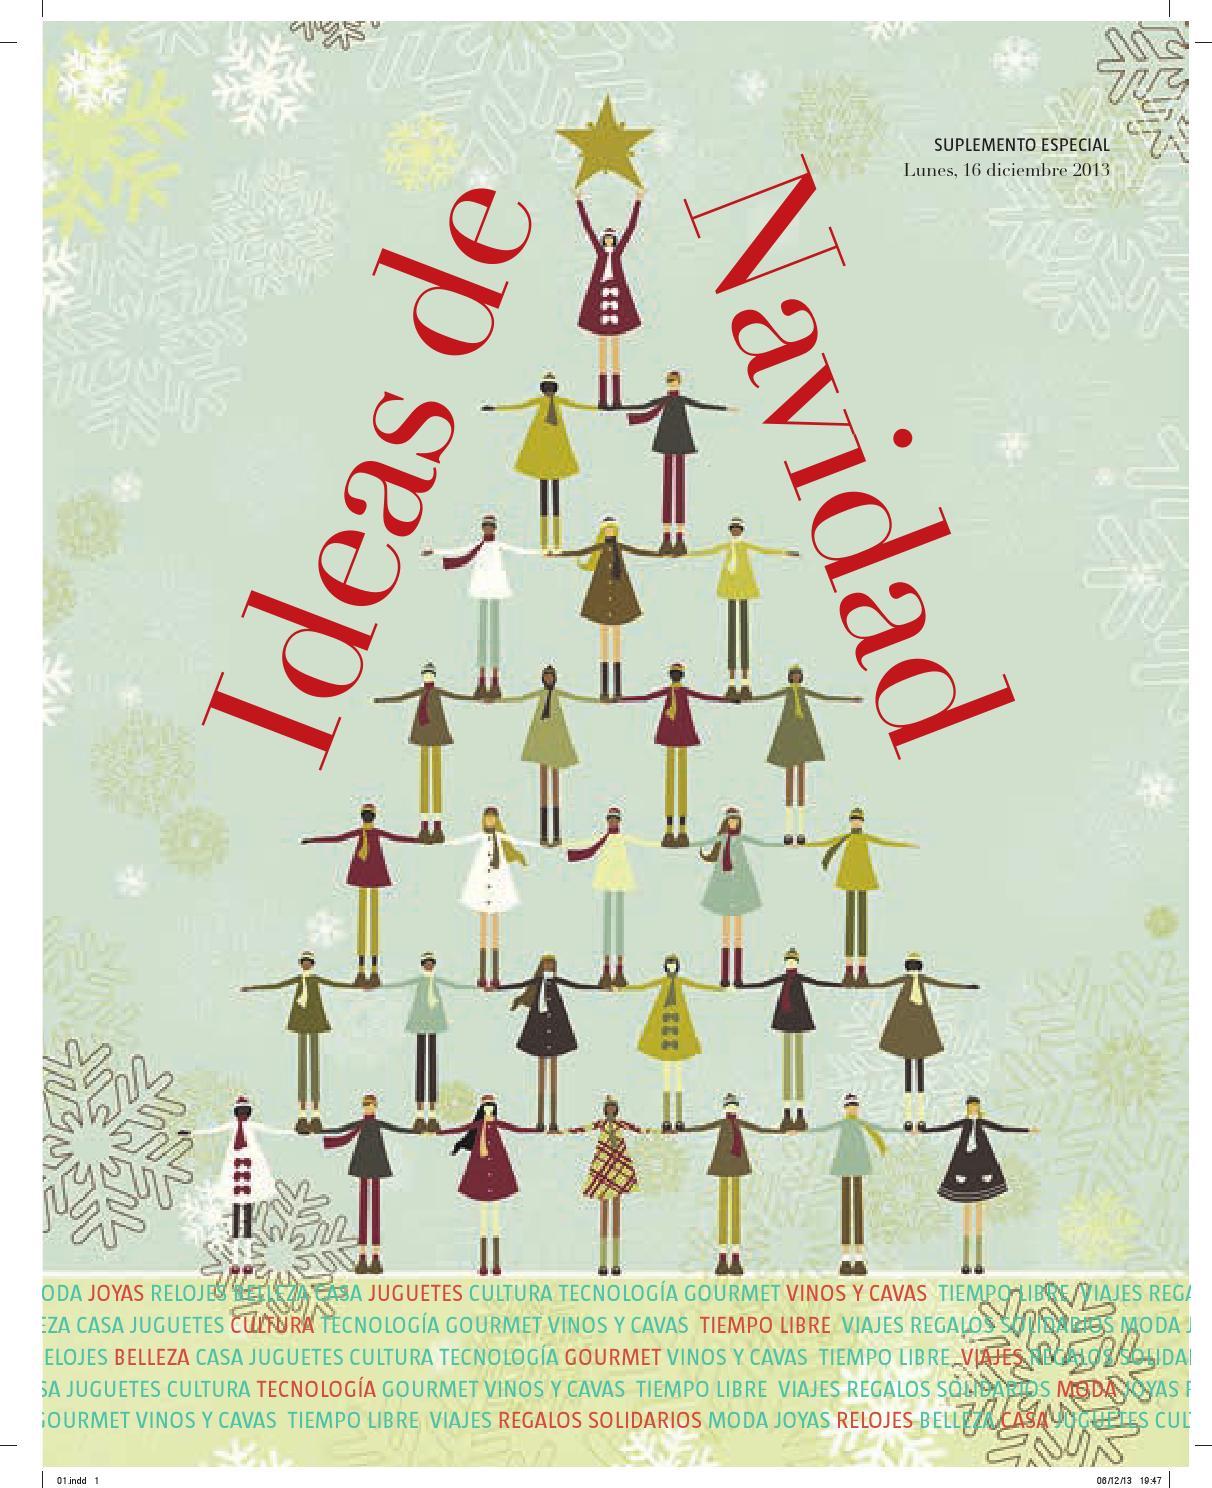 Ideas de Navidad by Edicions Clariana - issuu b9048f6703c8